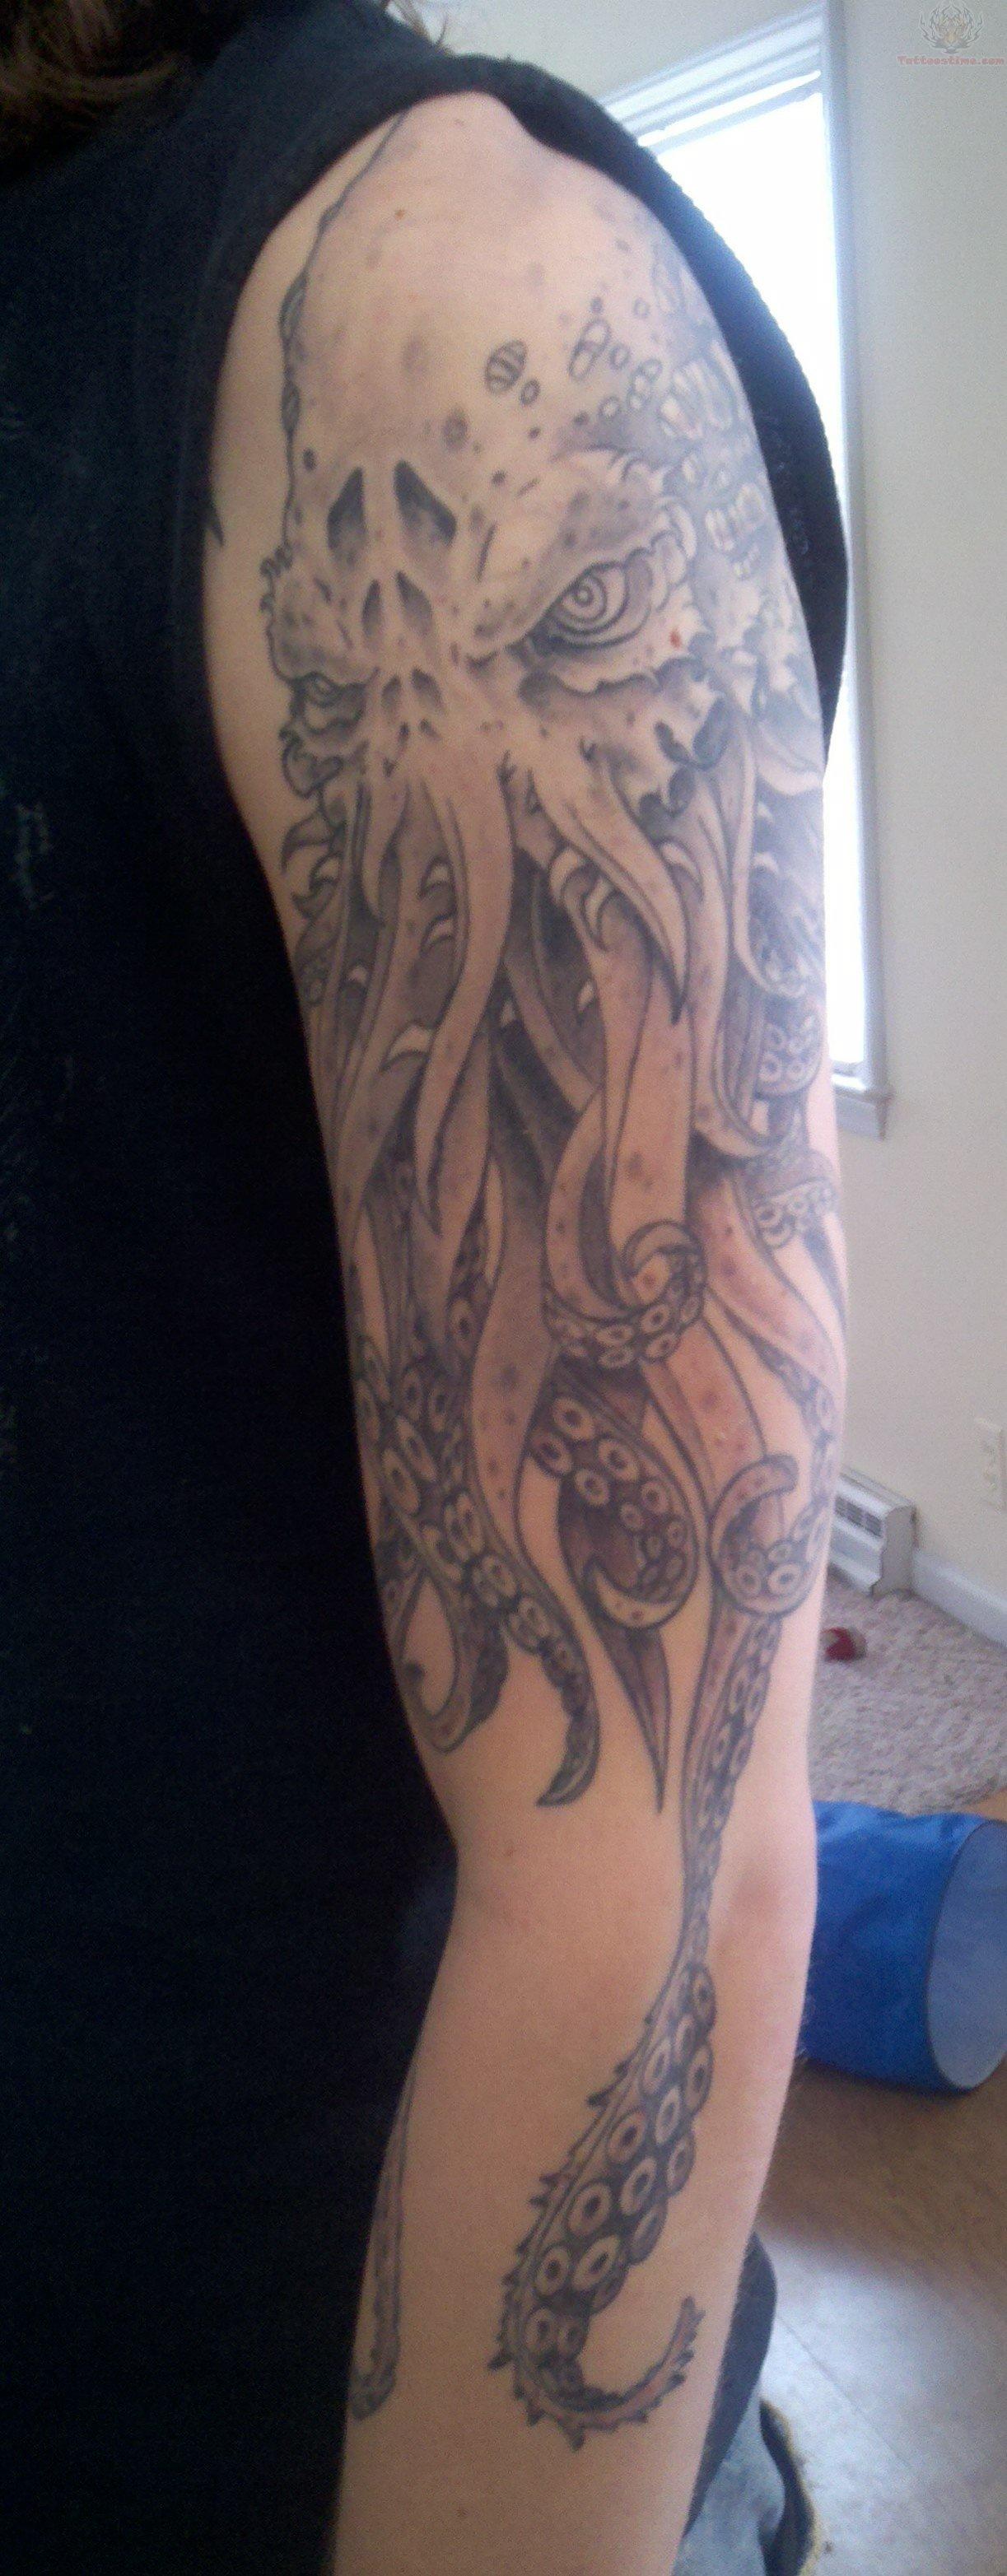 Cthulhu Tattoo Sleeve : cthulhu, tattoo, sleeve, Sleeve, Cthulhu, Tattoo